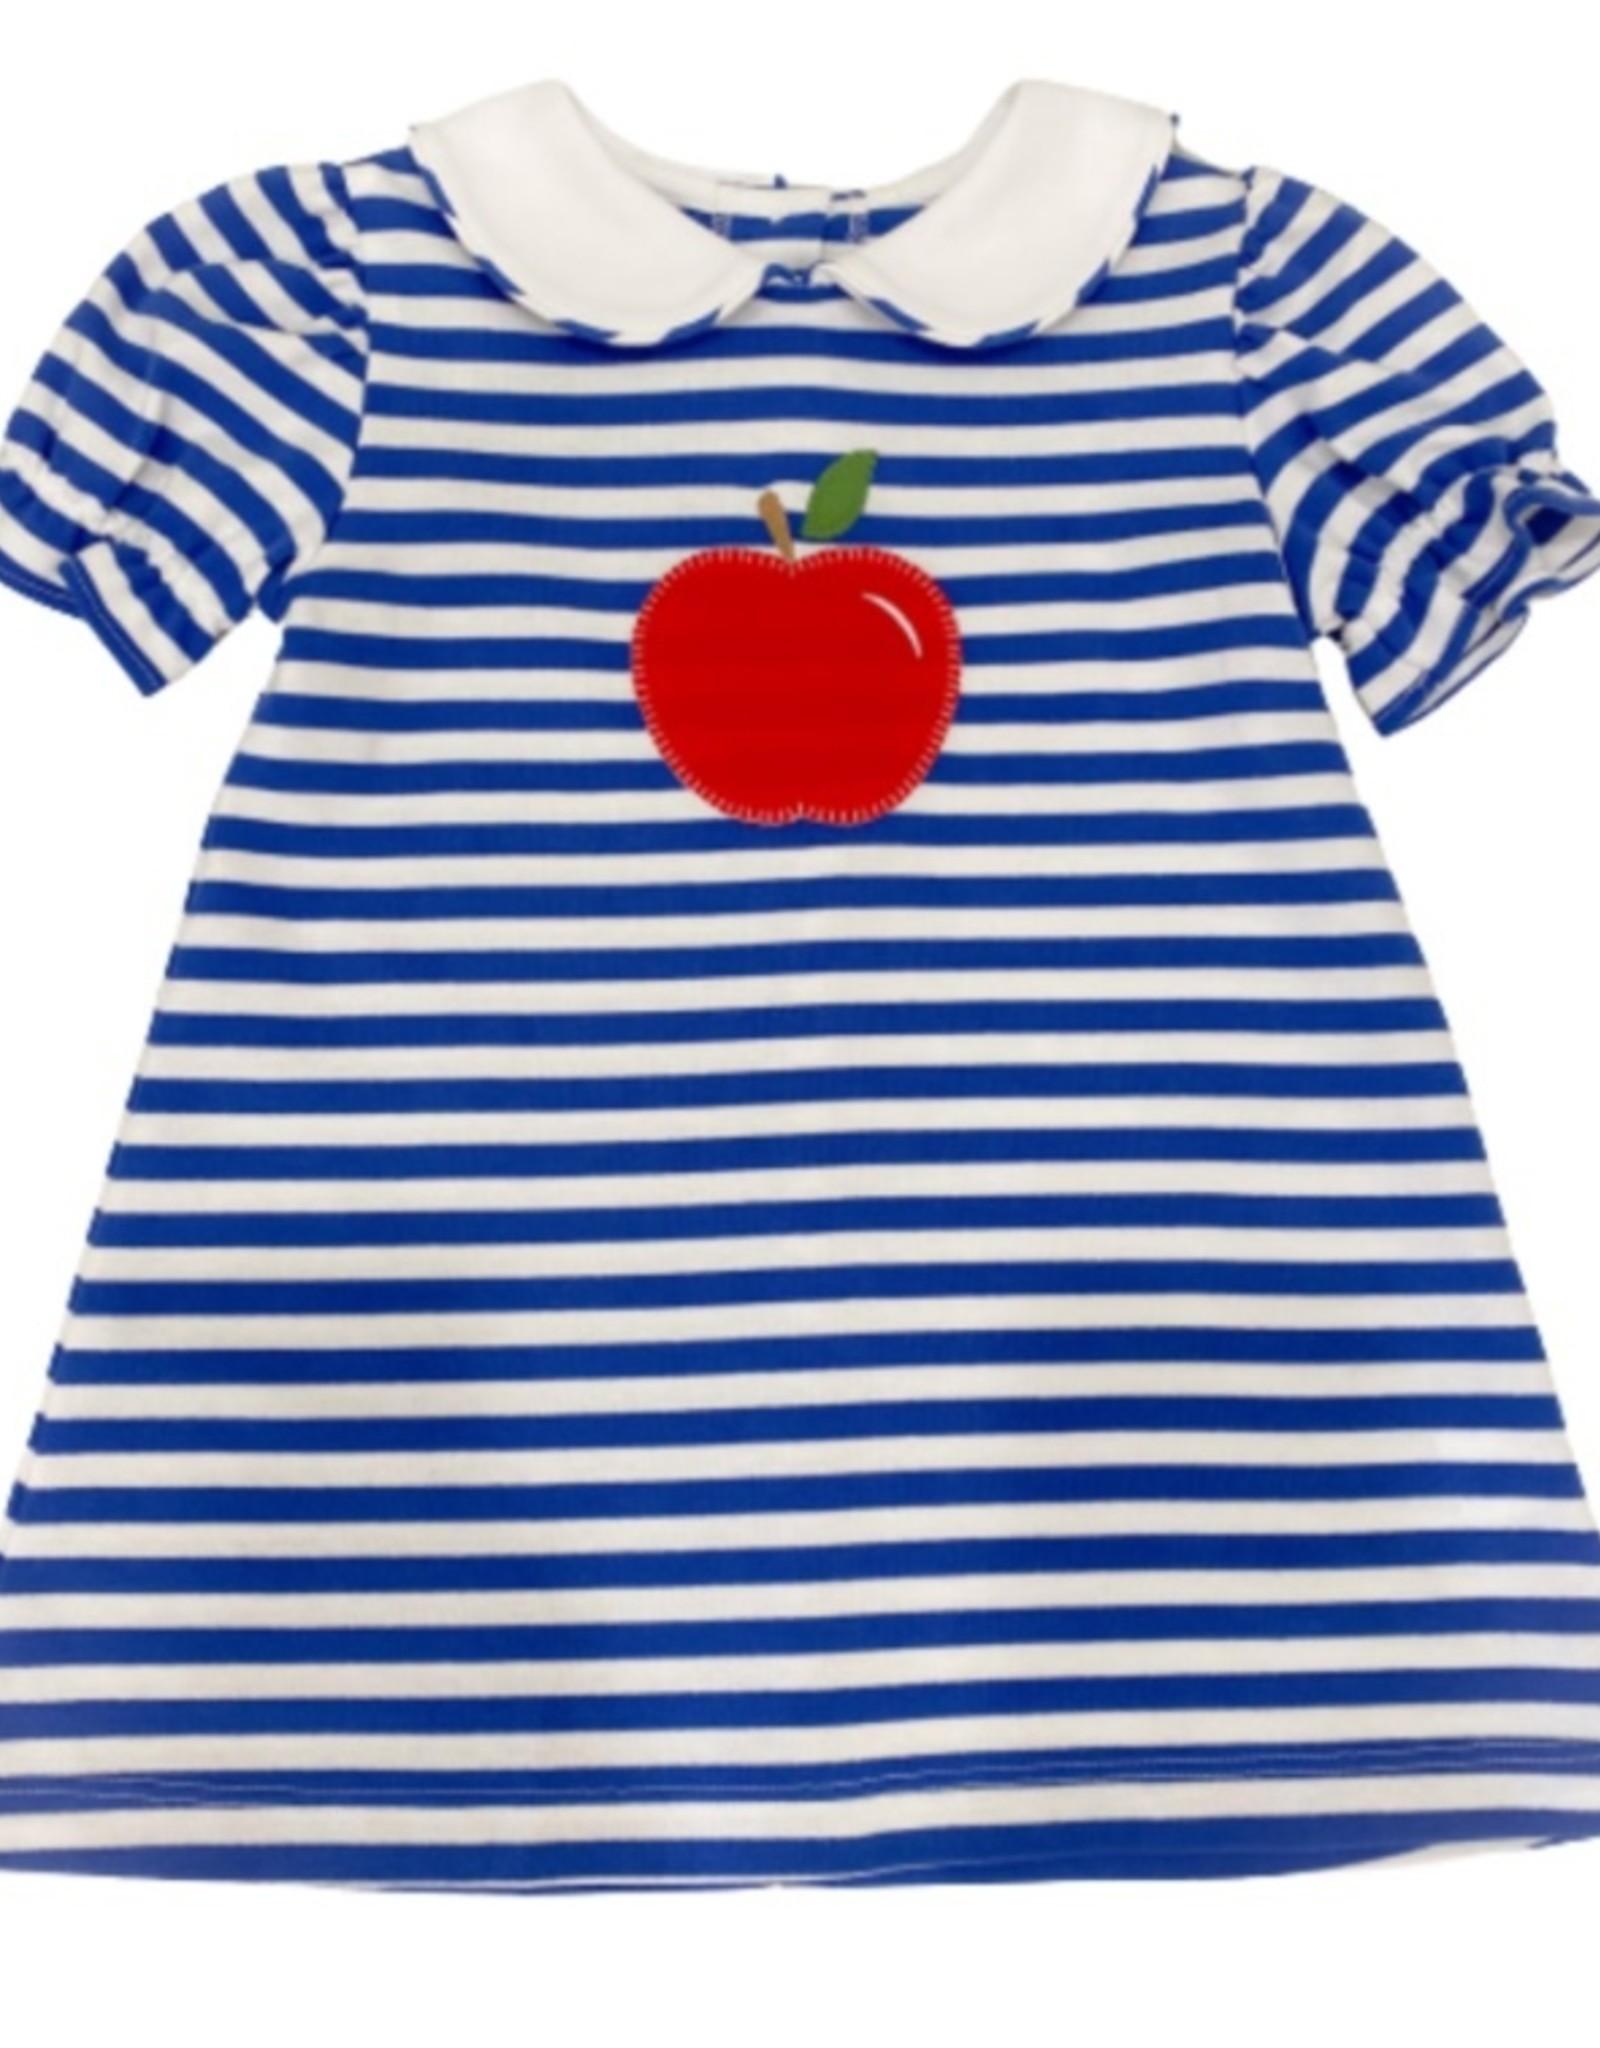 Zuccini Louisa Knit Apple Dress, Royal Blue